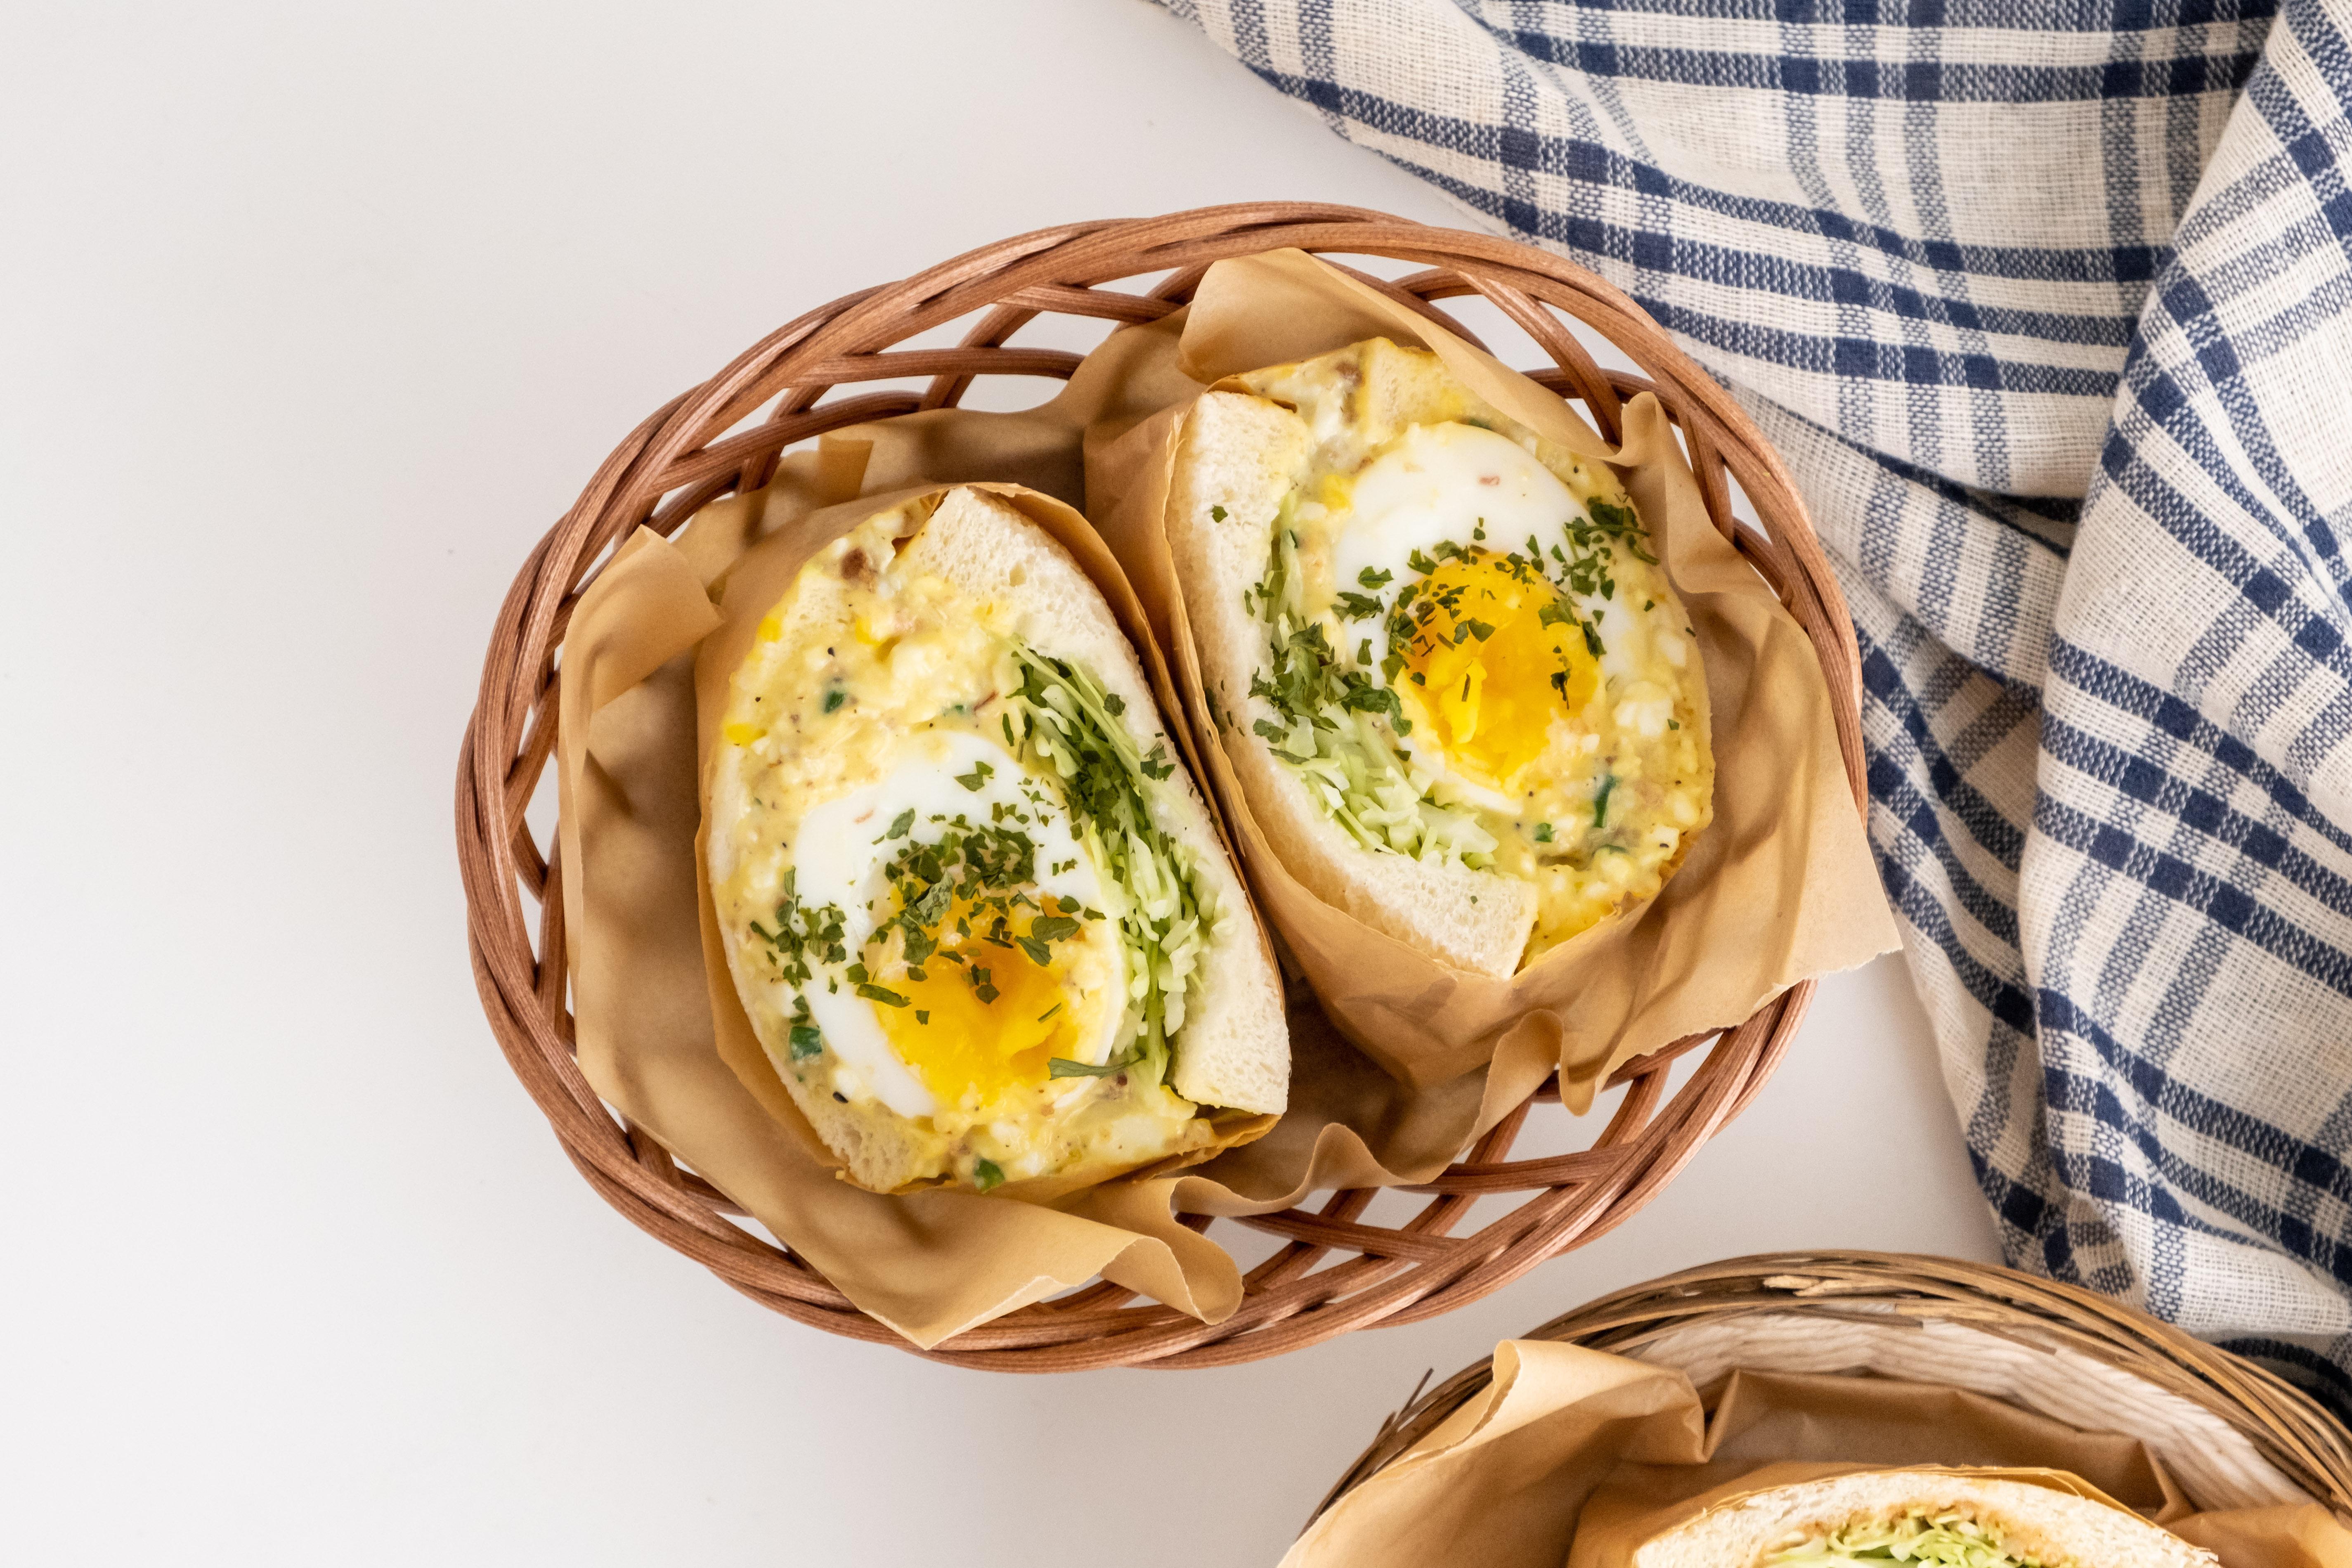 840x560-Egg-Mayo-Sandwich